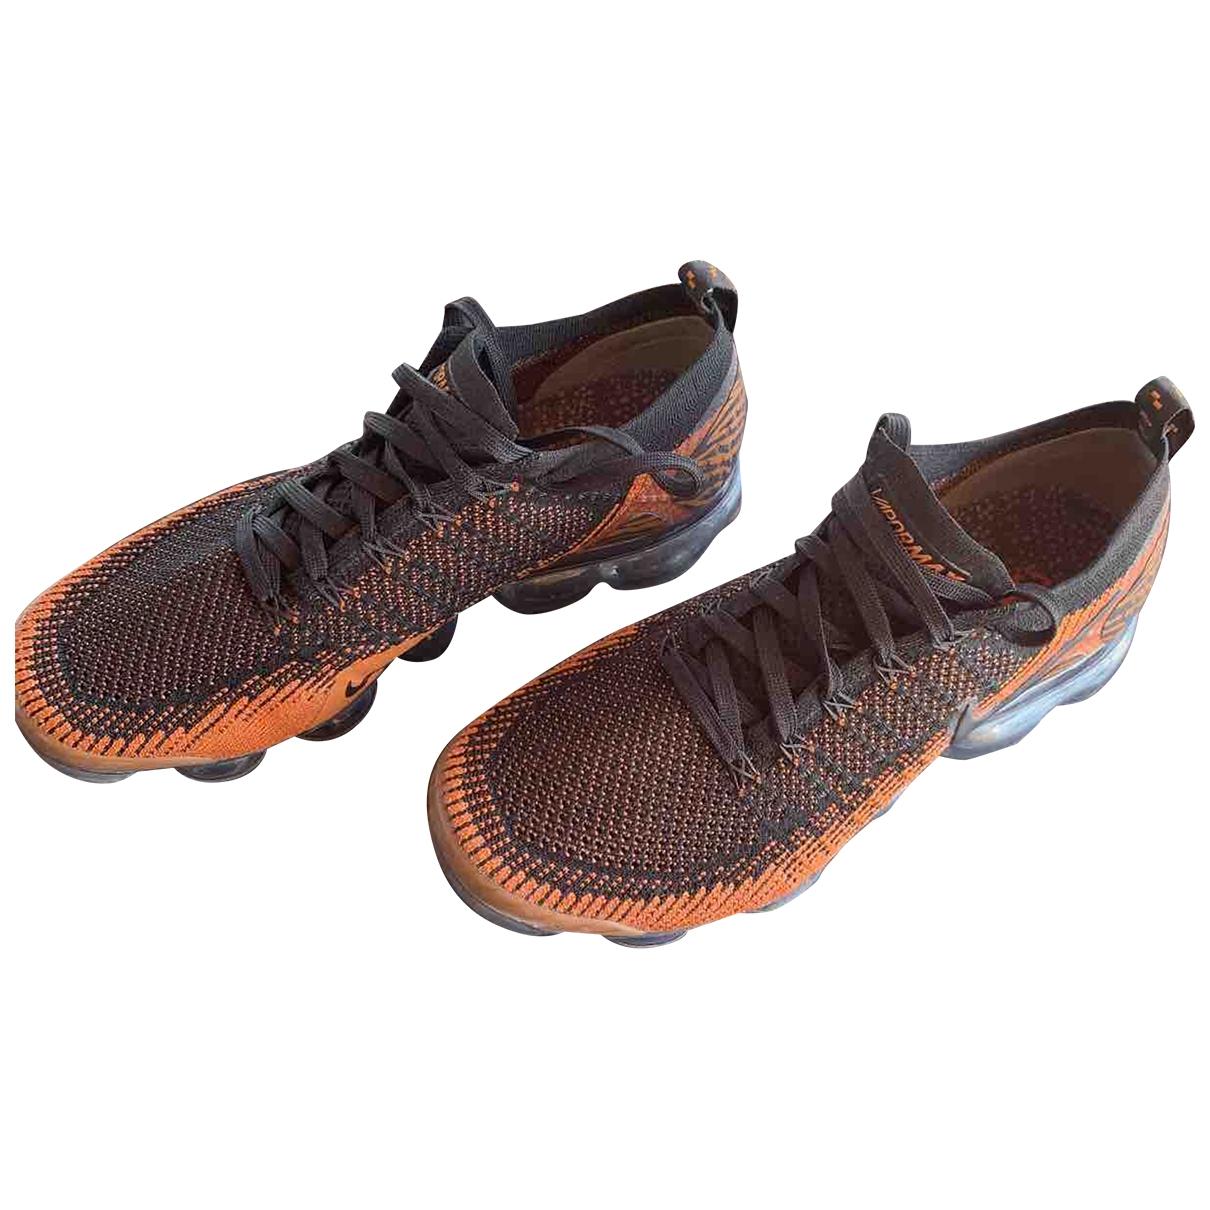 Nike Air VaporMax Black Cloth Trainers for Men 42.5 EU